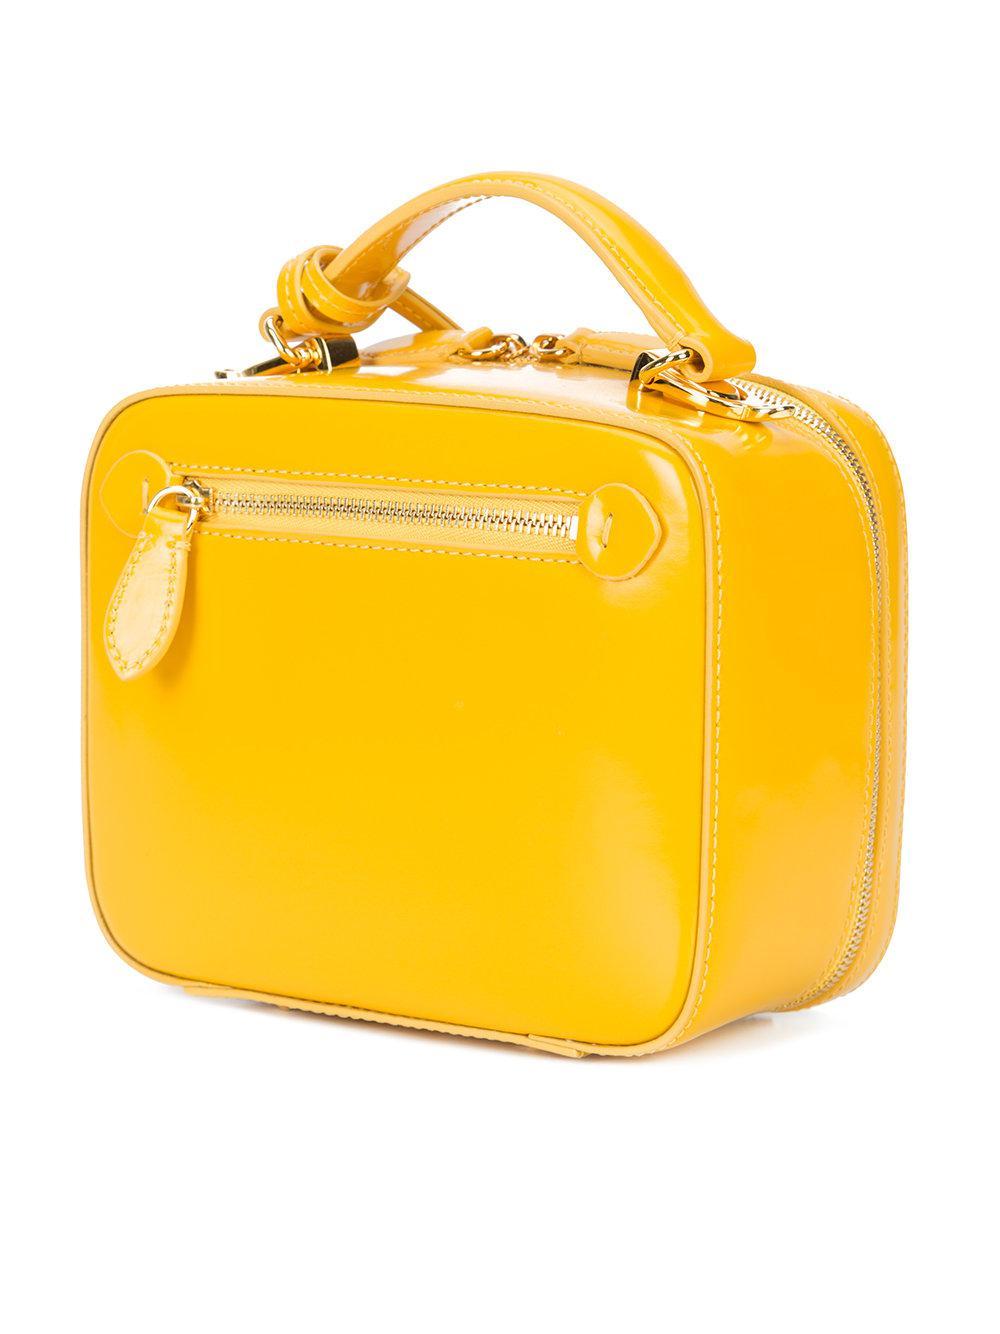 Mark Cross Leather Baby Laura Tote Bag in Yellow & Orange (Yellow)